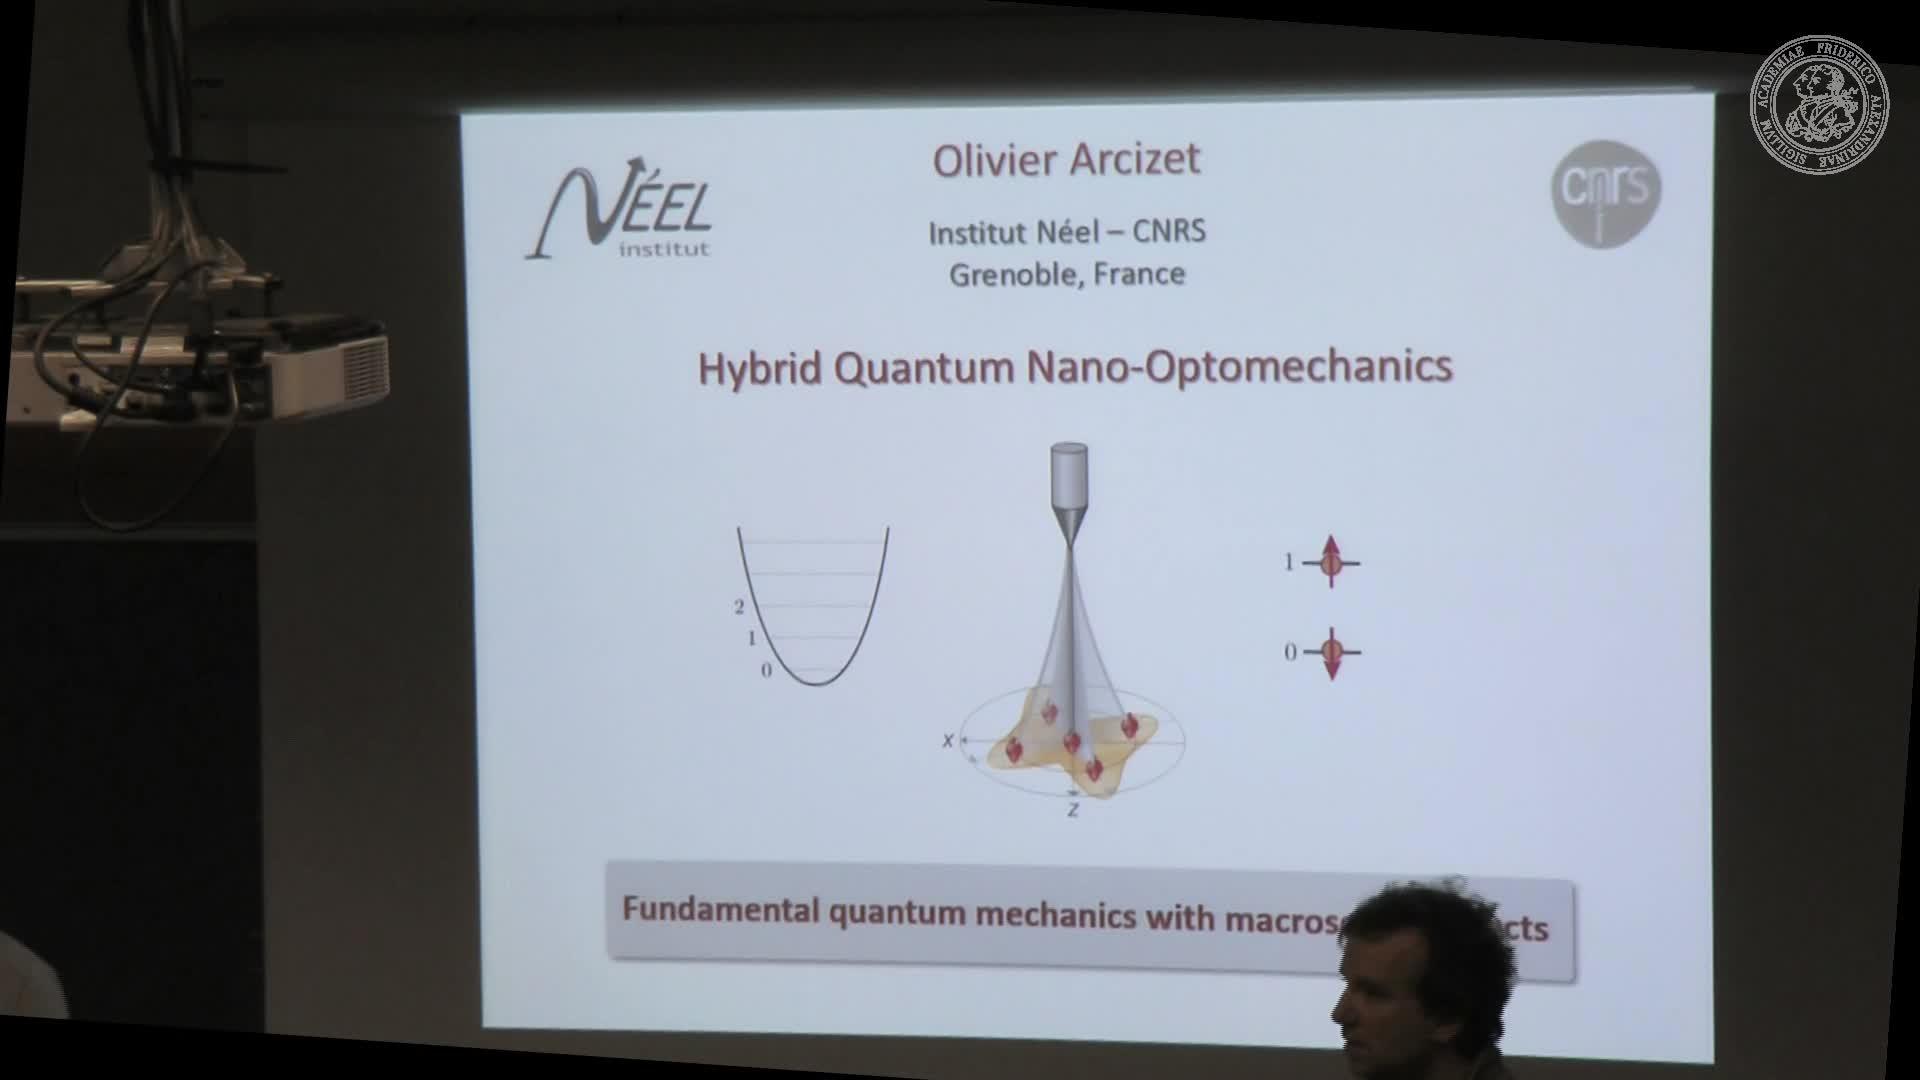 Hybrid Quantum Nano-Optomechanics preview image